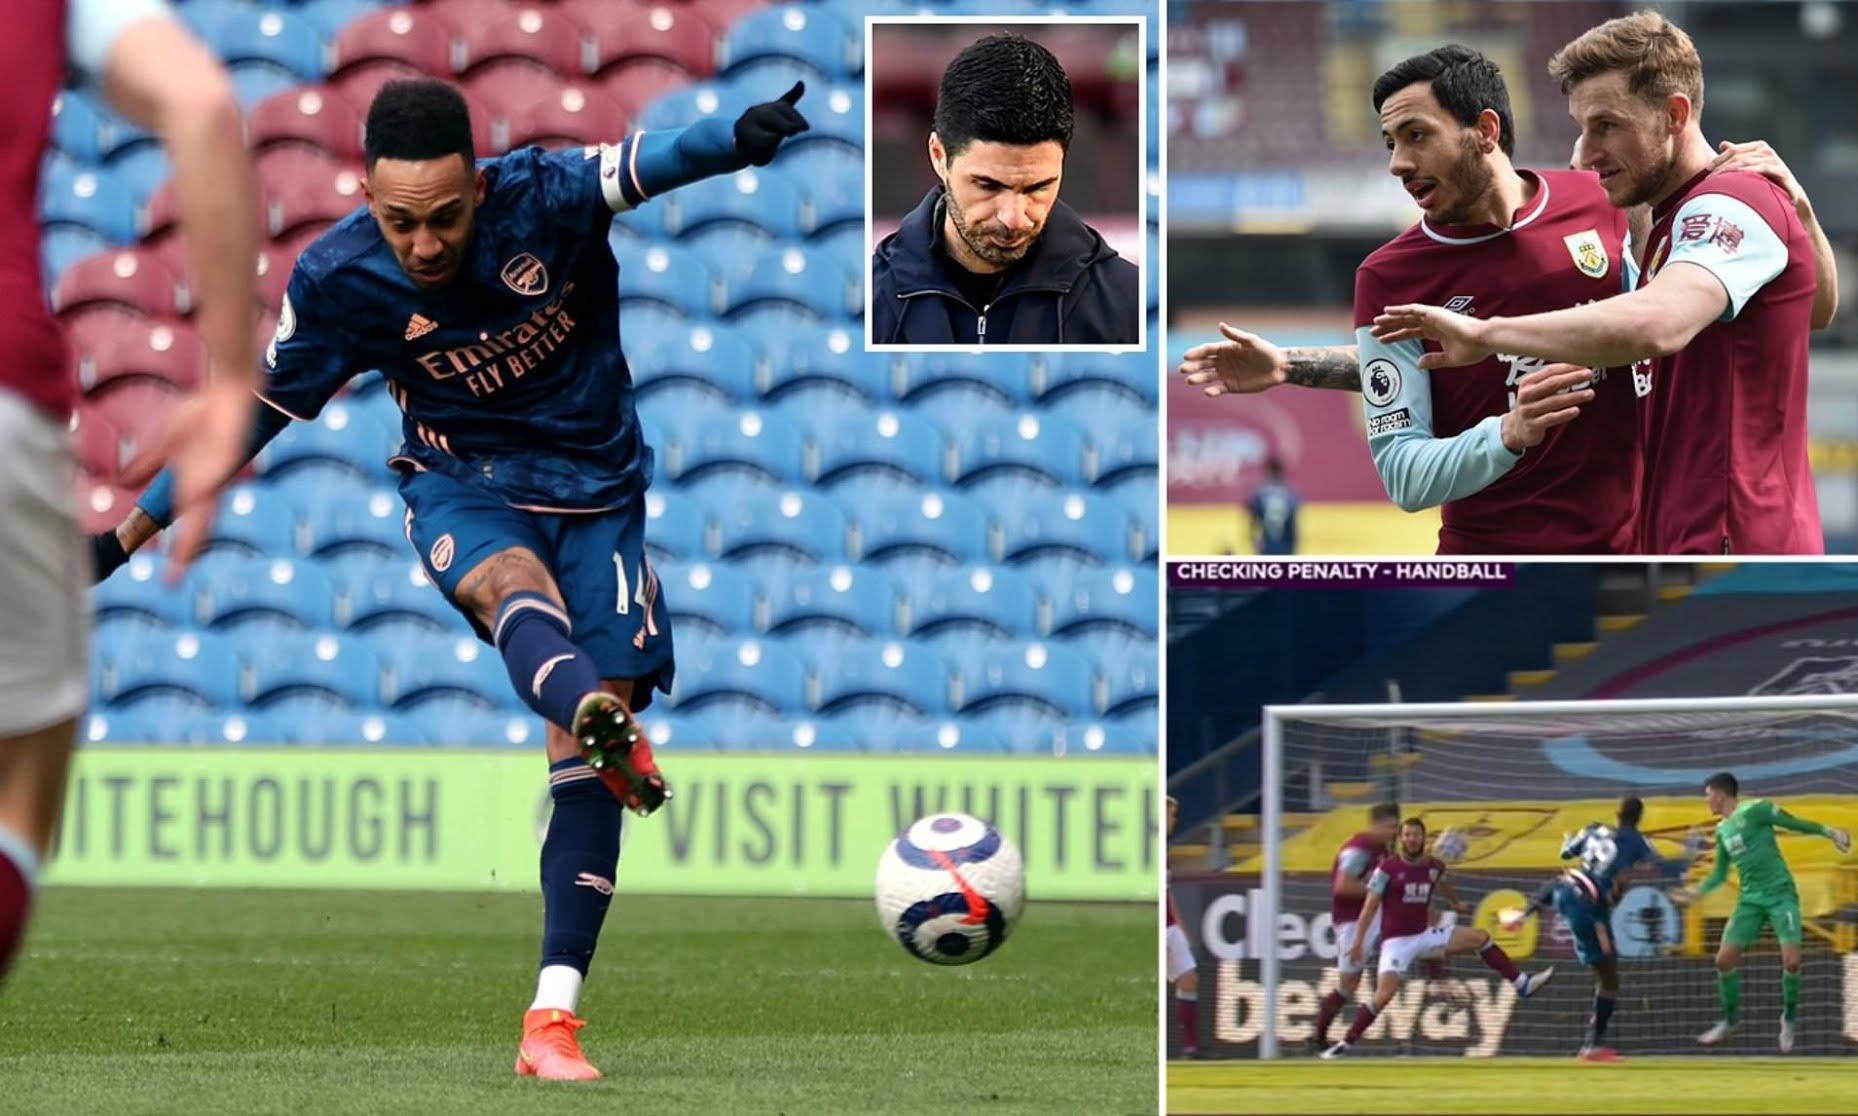 Burnley 1-Arsenal 1: Granit Xhaka error costs Gunners in Premier League clash